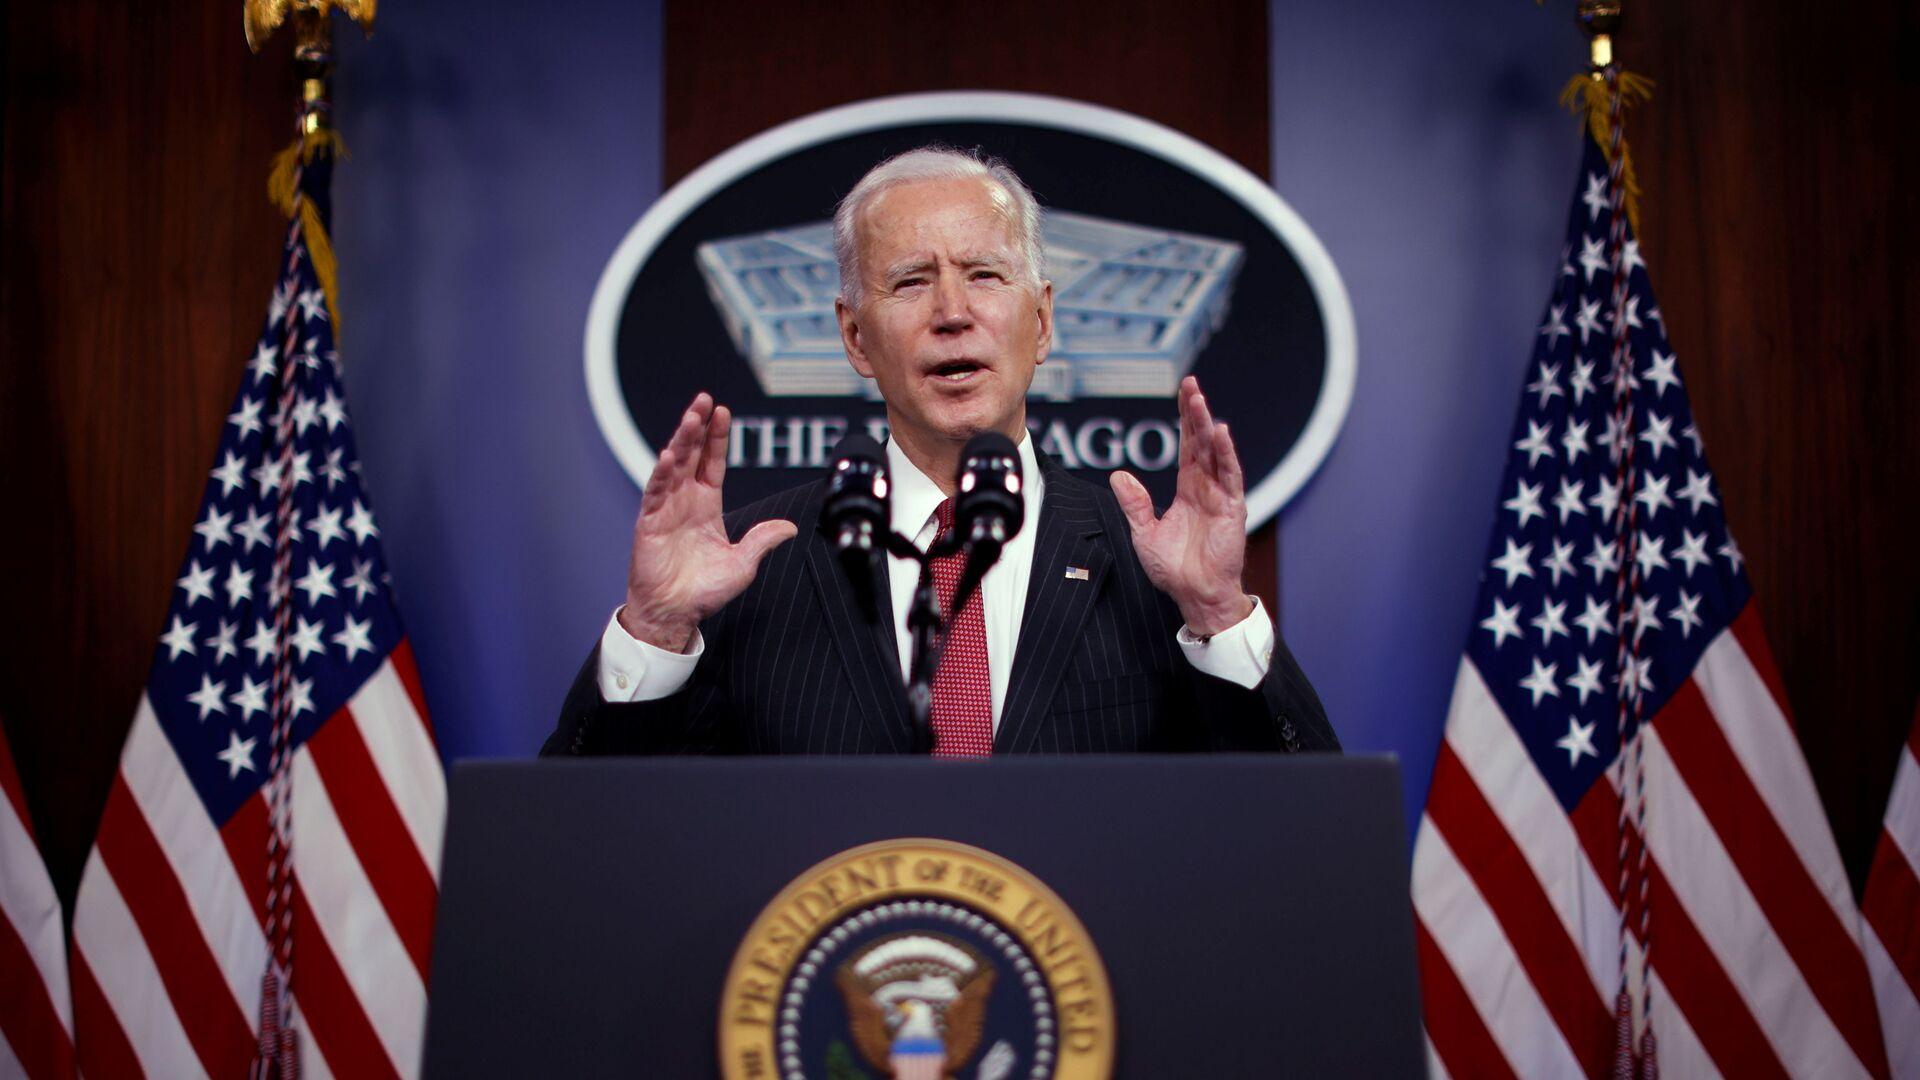 Joe Biden, presidente de EEUU - Sputnik Mundo, 1920, 25.02.2021